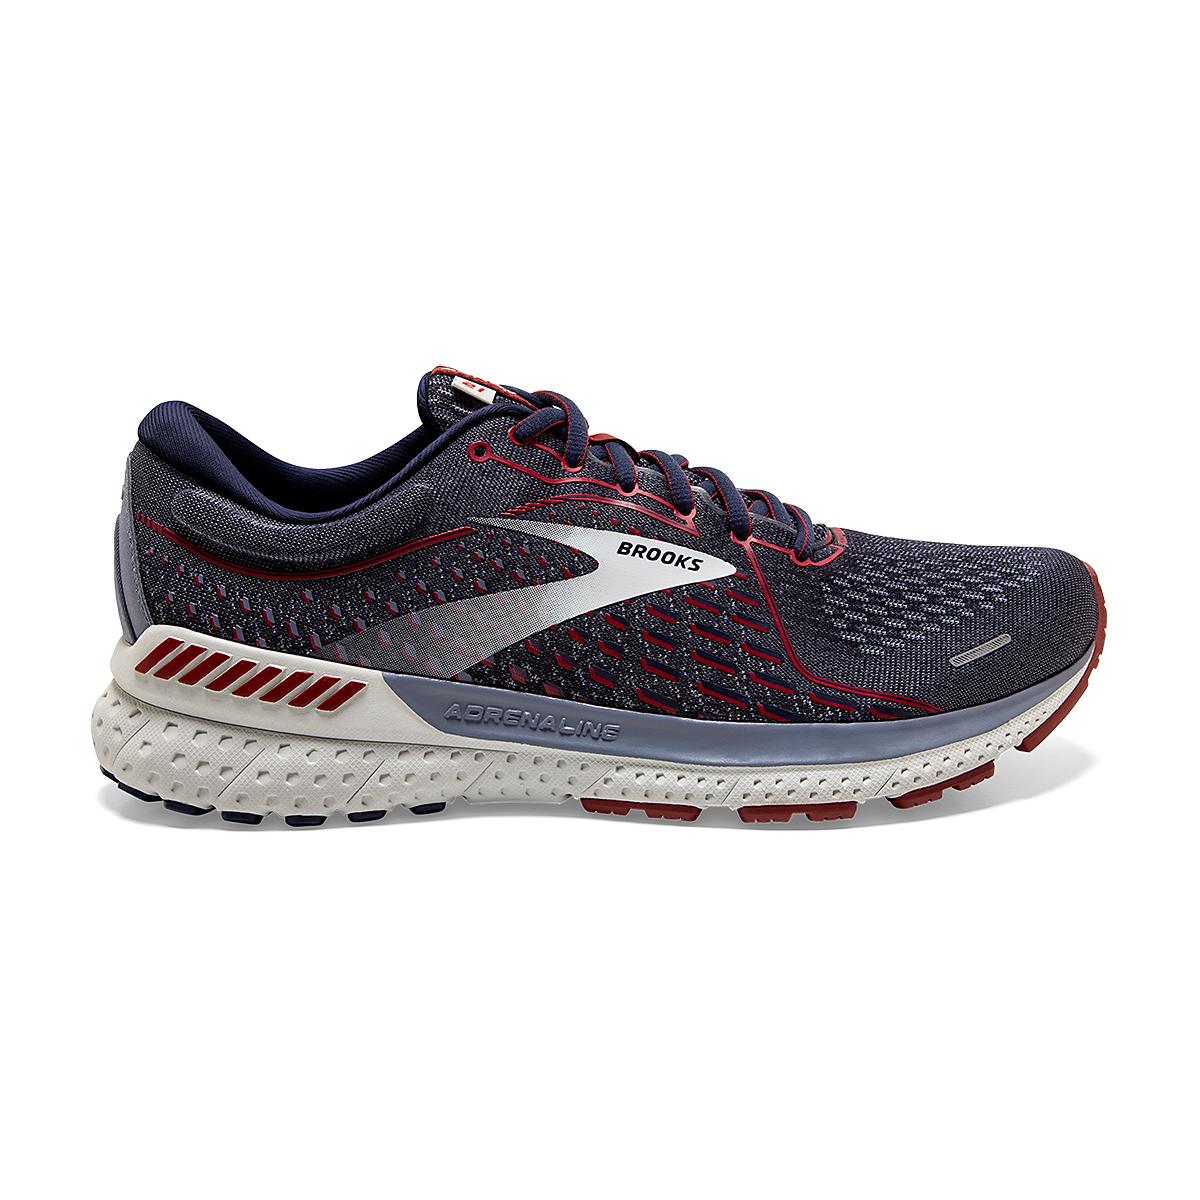 Men's Brooks Adrenaline GTS 21 Running Shoe - Color: Peacoat/Grey/Red - Size: 7 - Width: Regular, Peacoat/Grey/Red, large, image 1